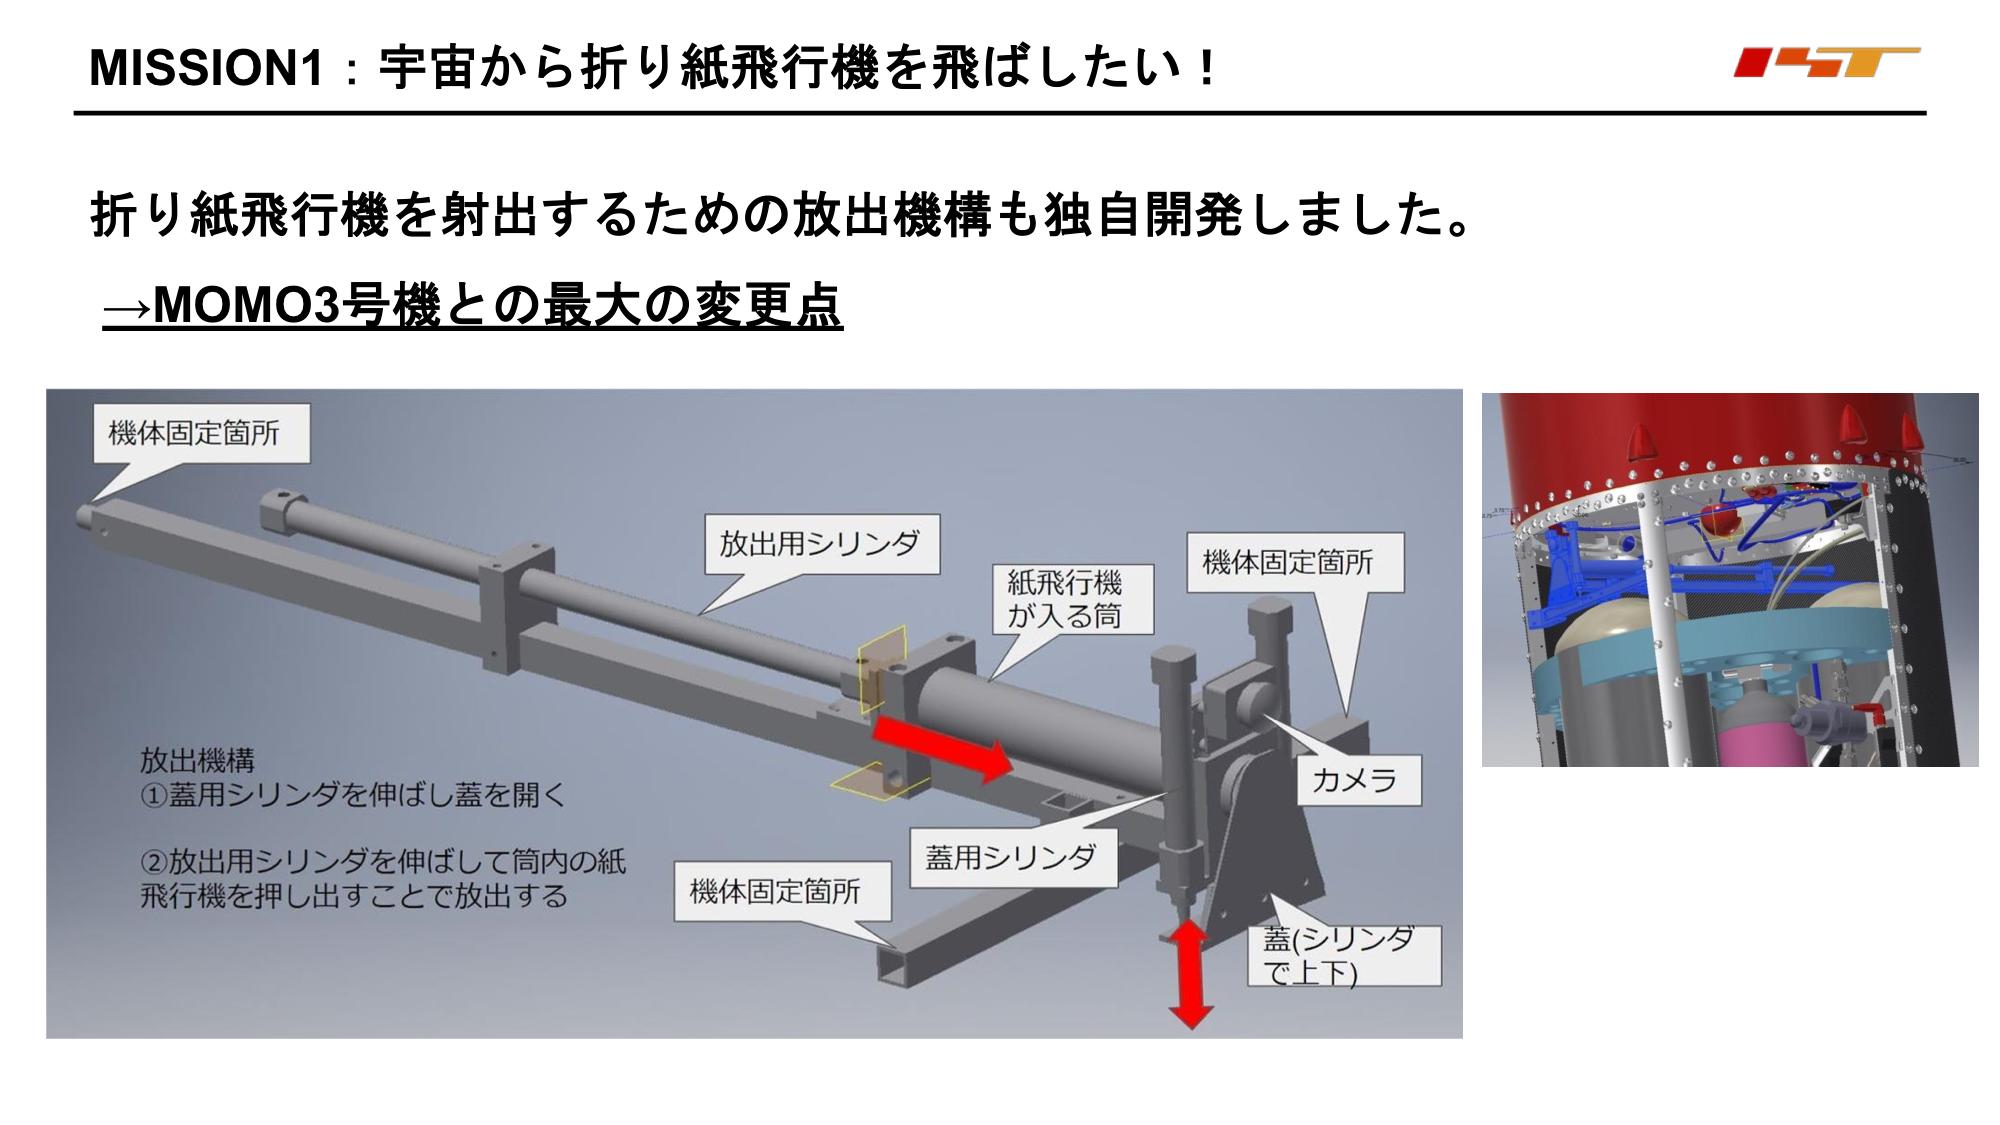 f:id:Imamura:20190628161208p:plain